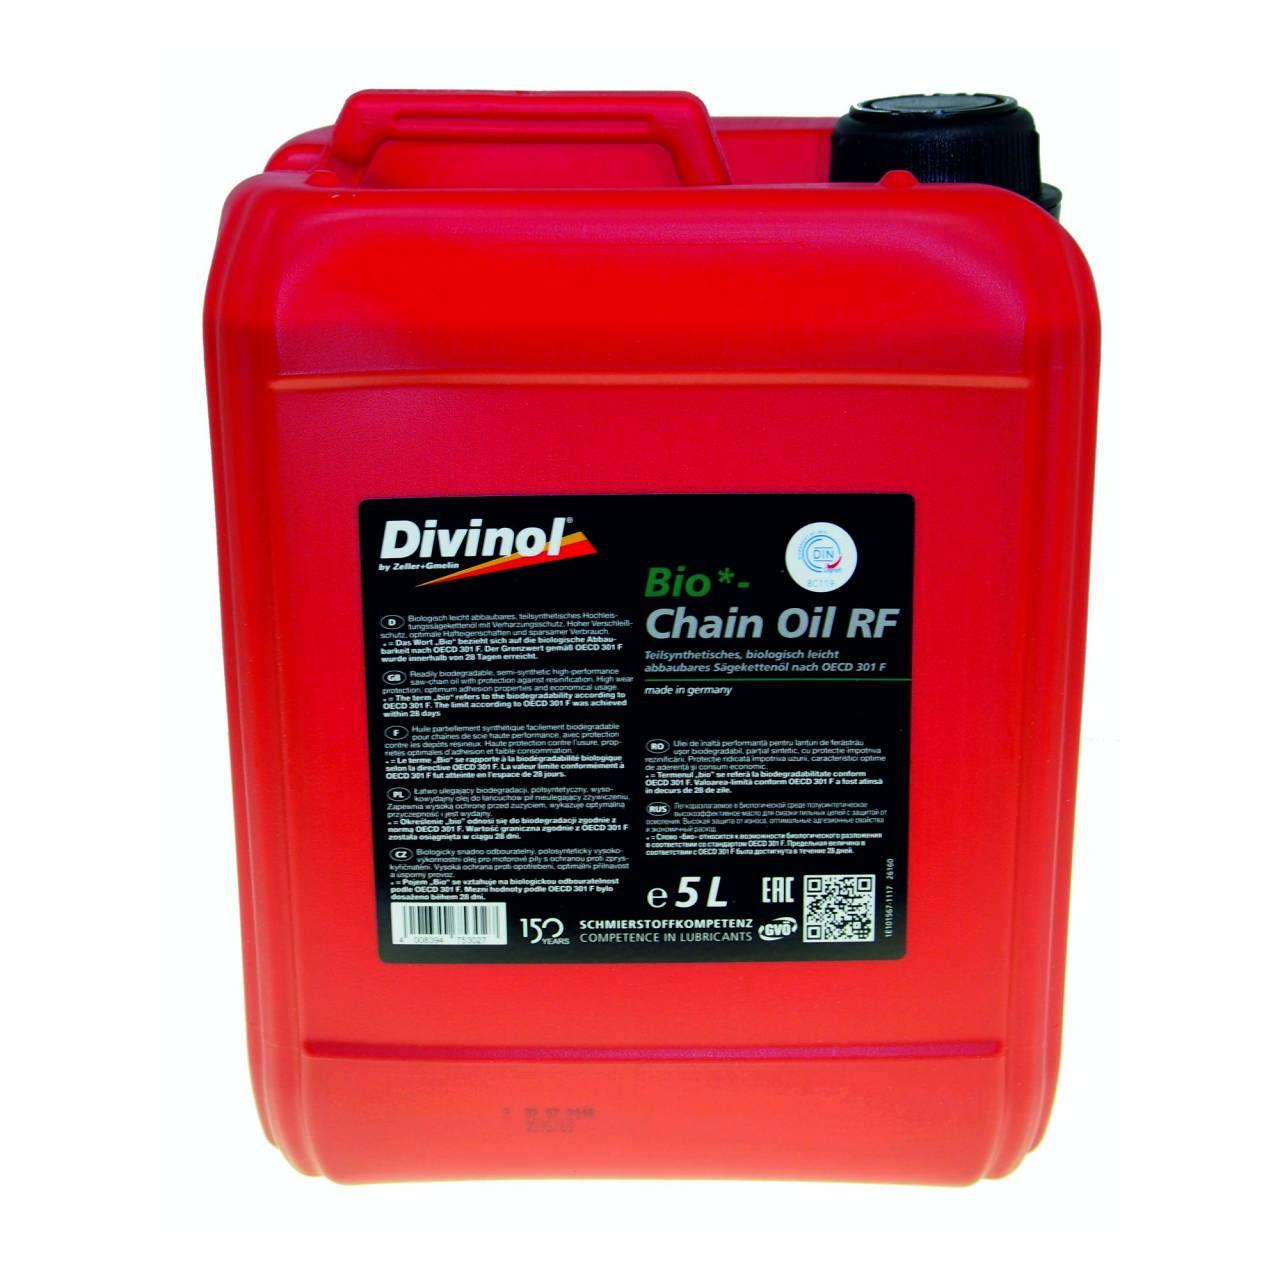 Bio-Chain Oil RF 'Divinol' / 5,0 l Kanister